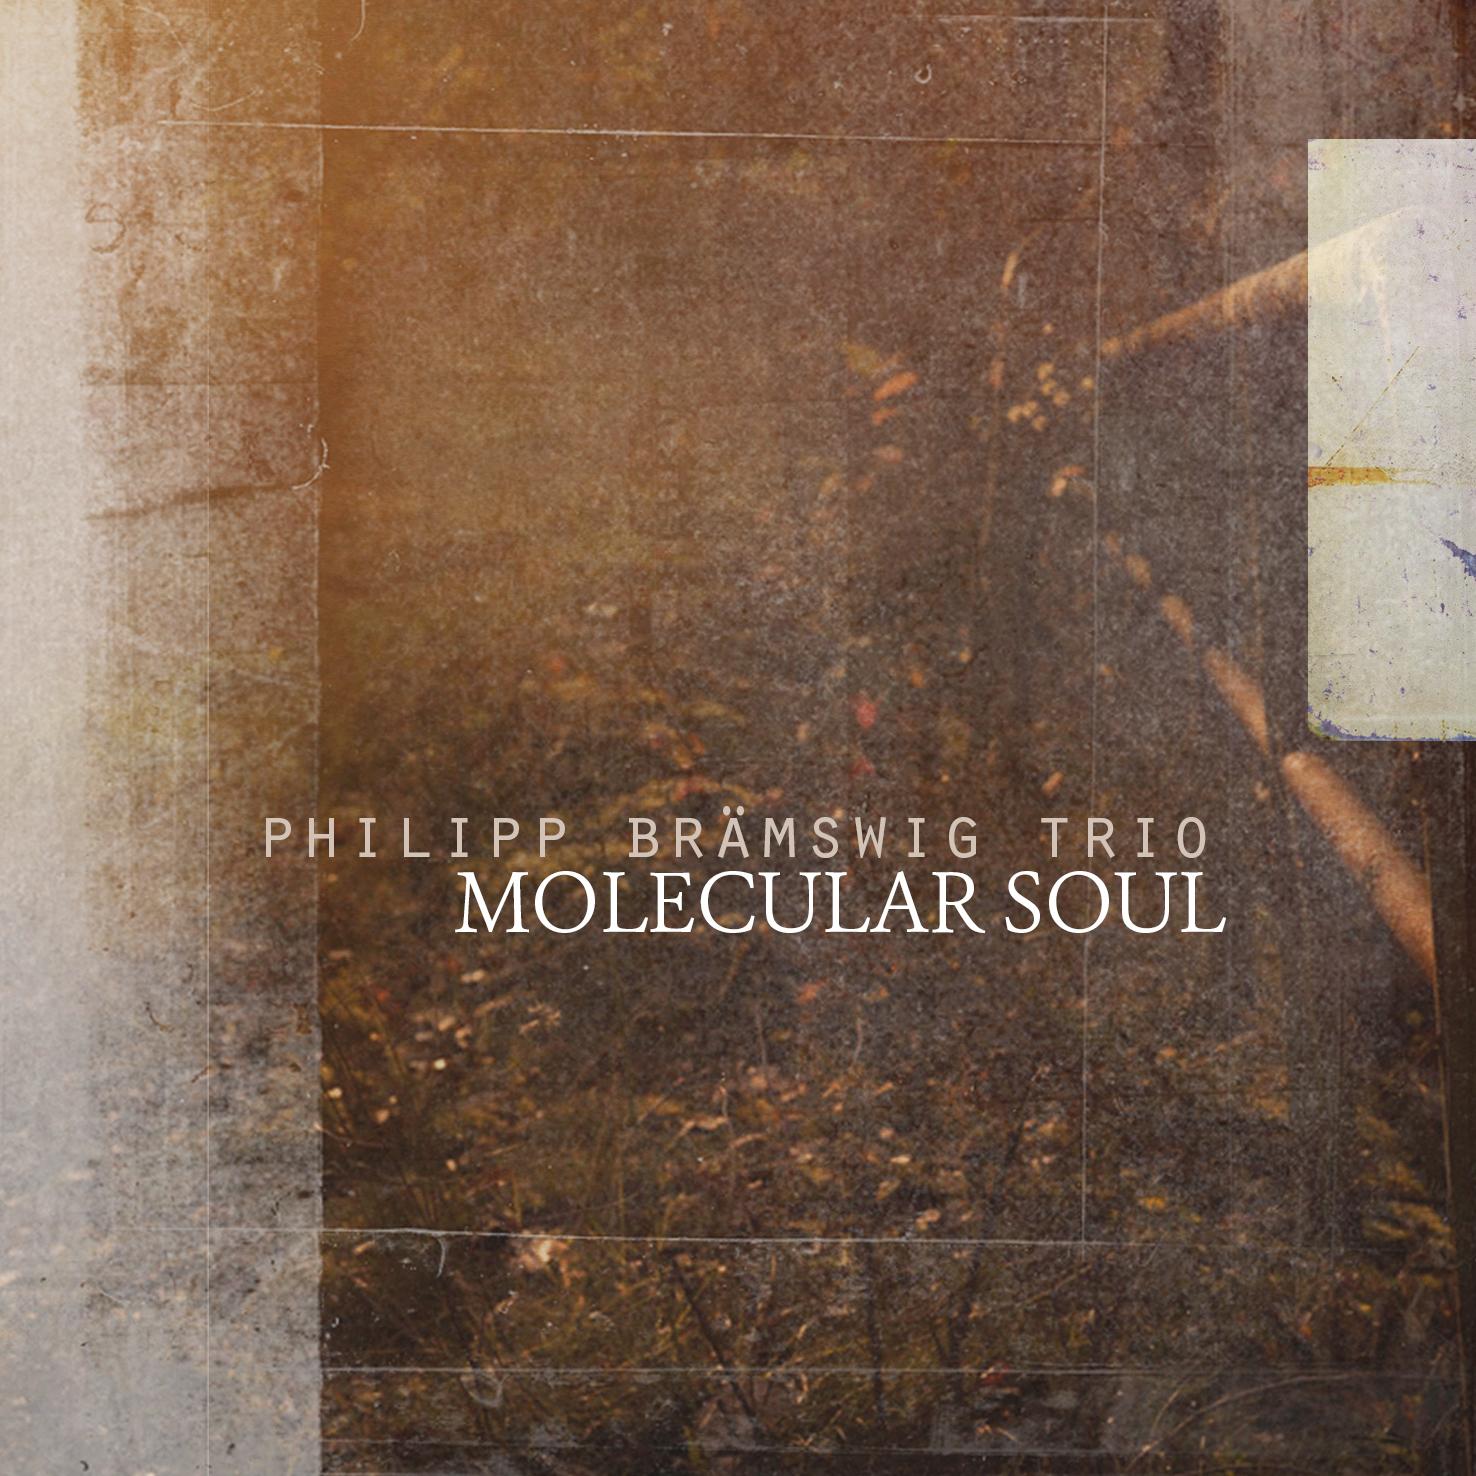 Philipp Brämswig Trio - Molecular soul